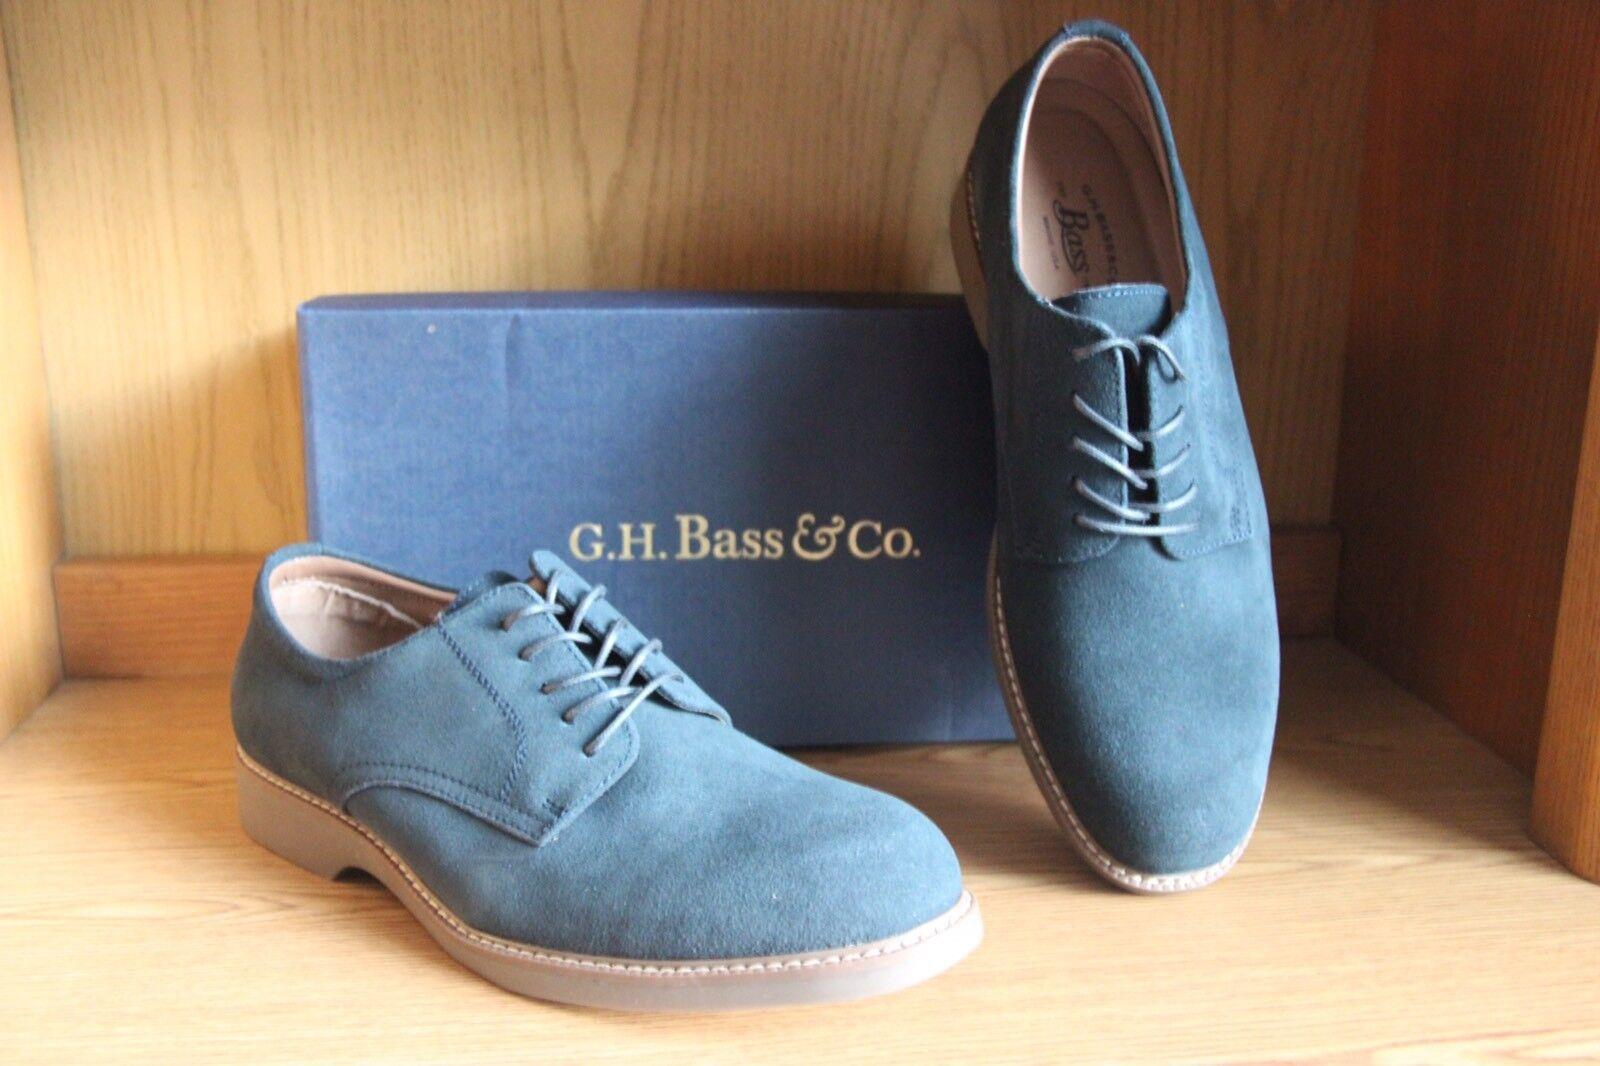 G.H. Bass Pasadena Suede Pelle Navy Blue Oxford Shoe Uomo Taglia 11.5  7013206